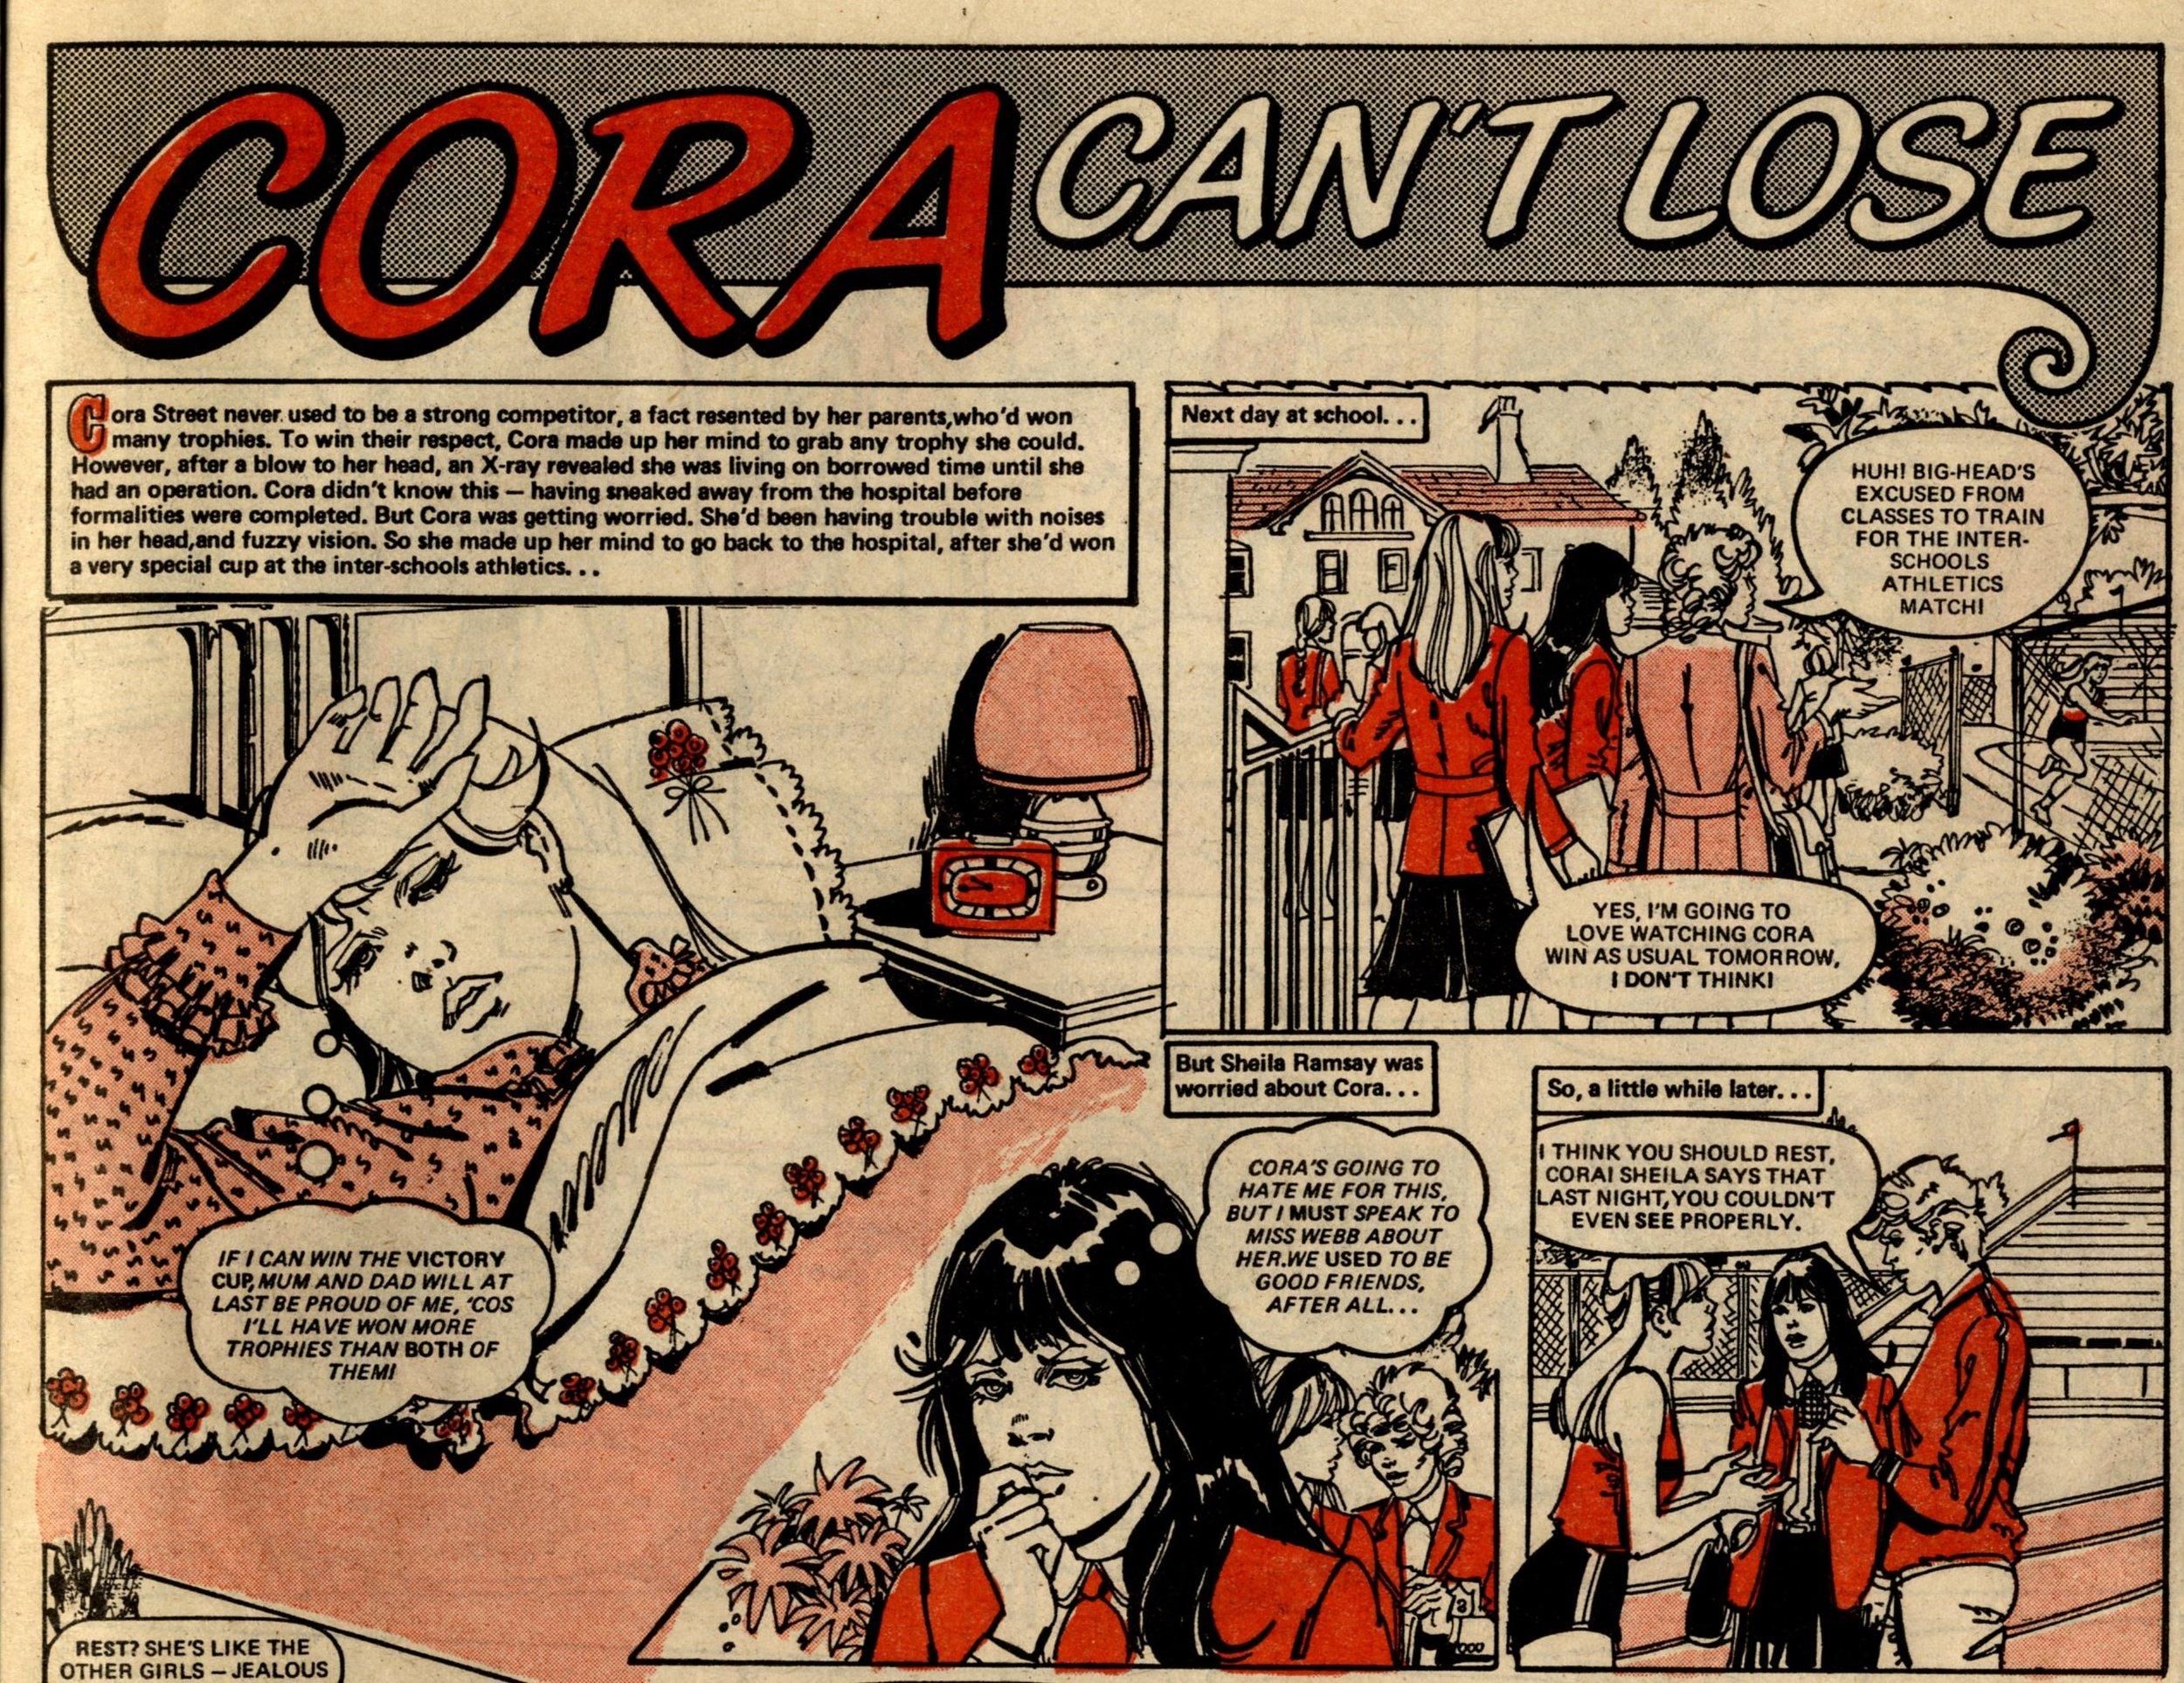 Cora Can't Lose: Juliana Buch (artist)